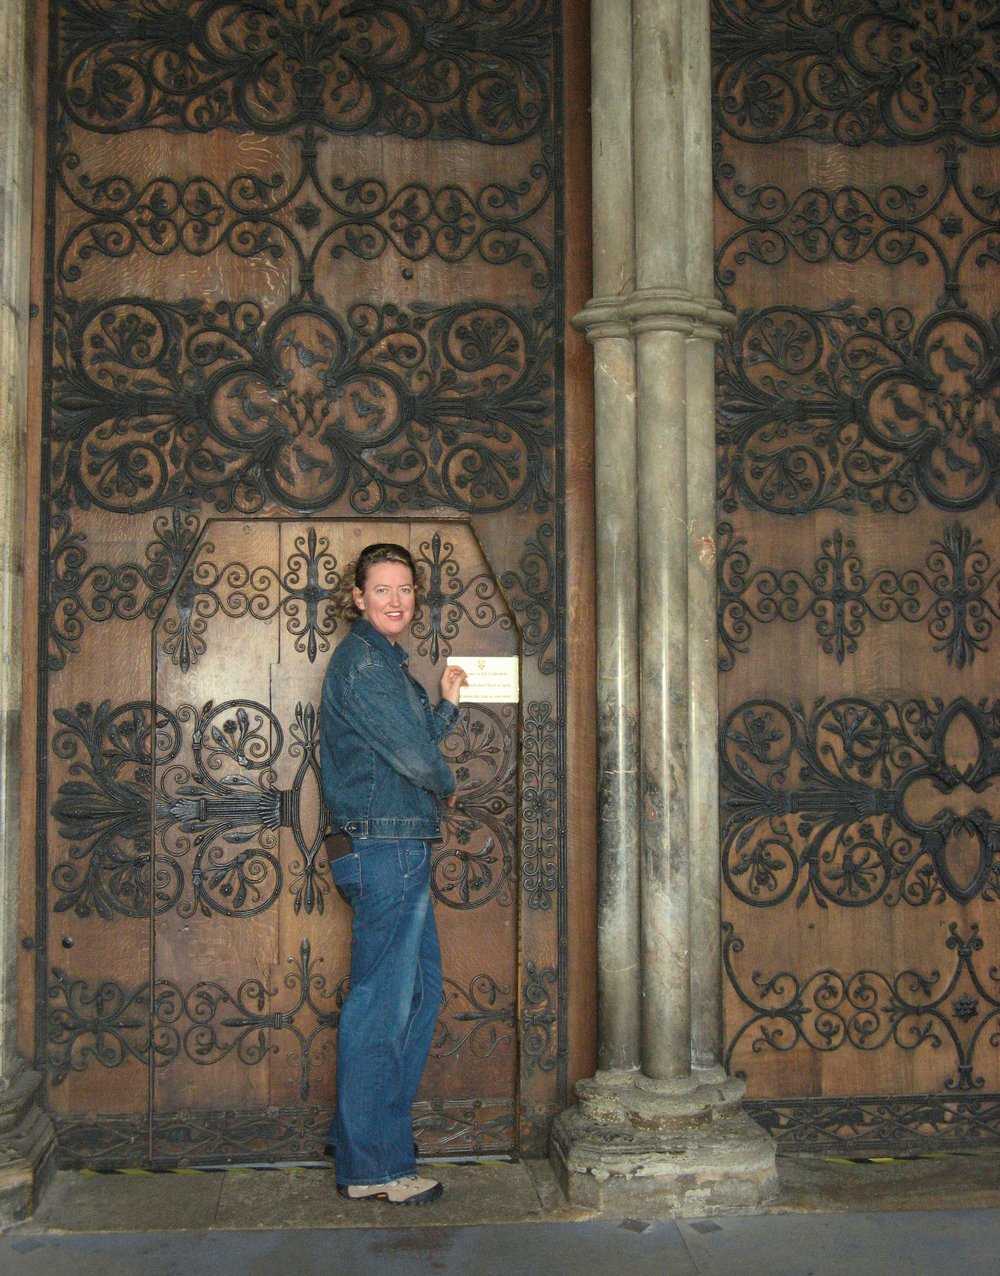 EMMA-JANE IN CAMBRIDGE, ENGLAND, 2008